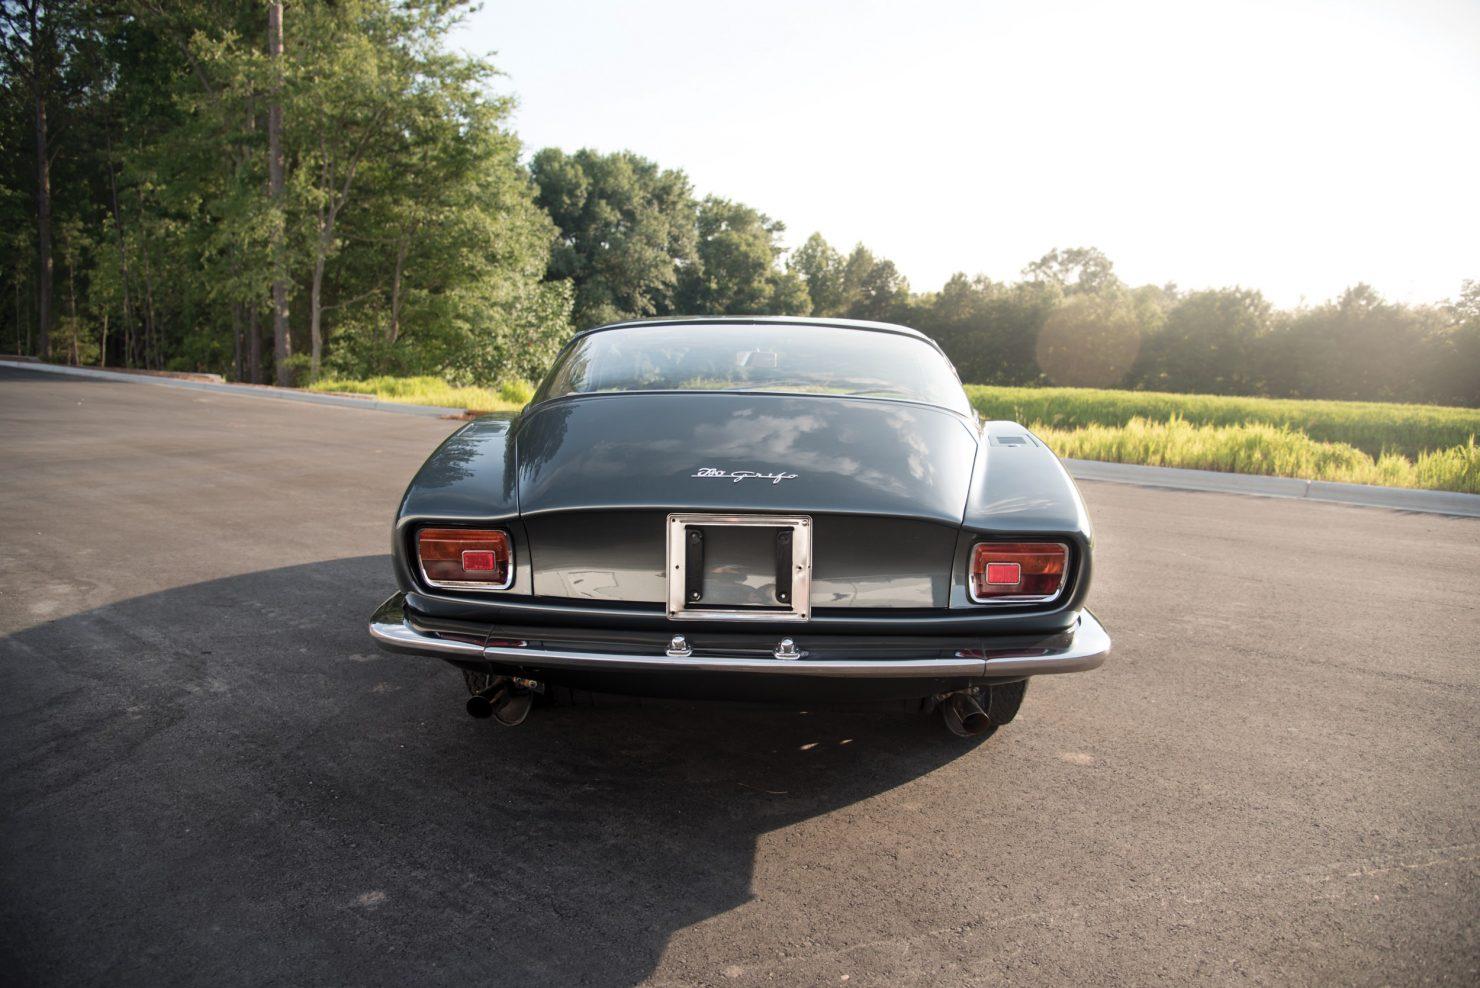 iso grifo car 11 1480x988 - 1966 Iso Grifo GL Series I